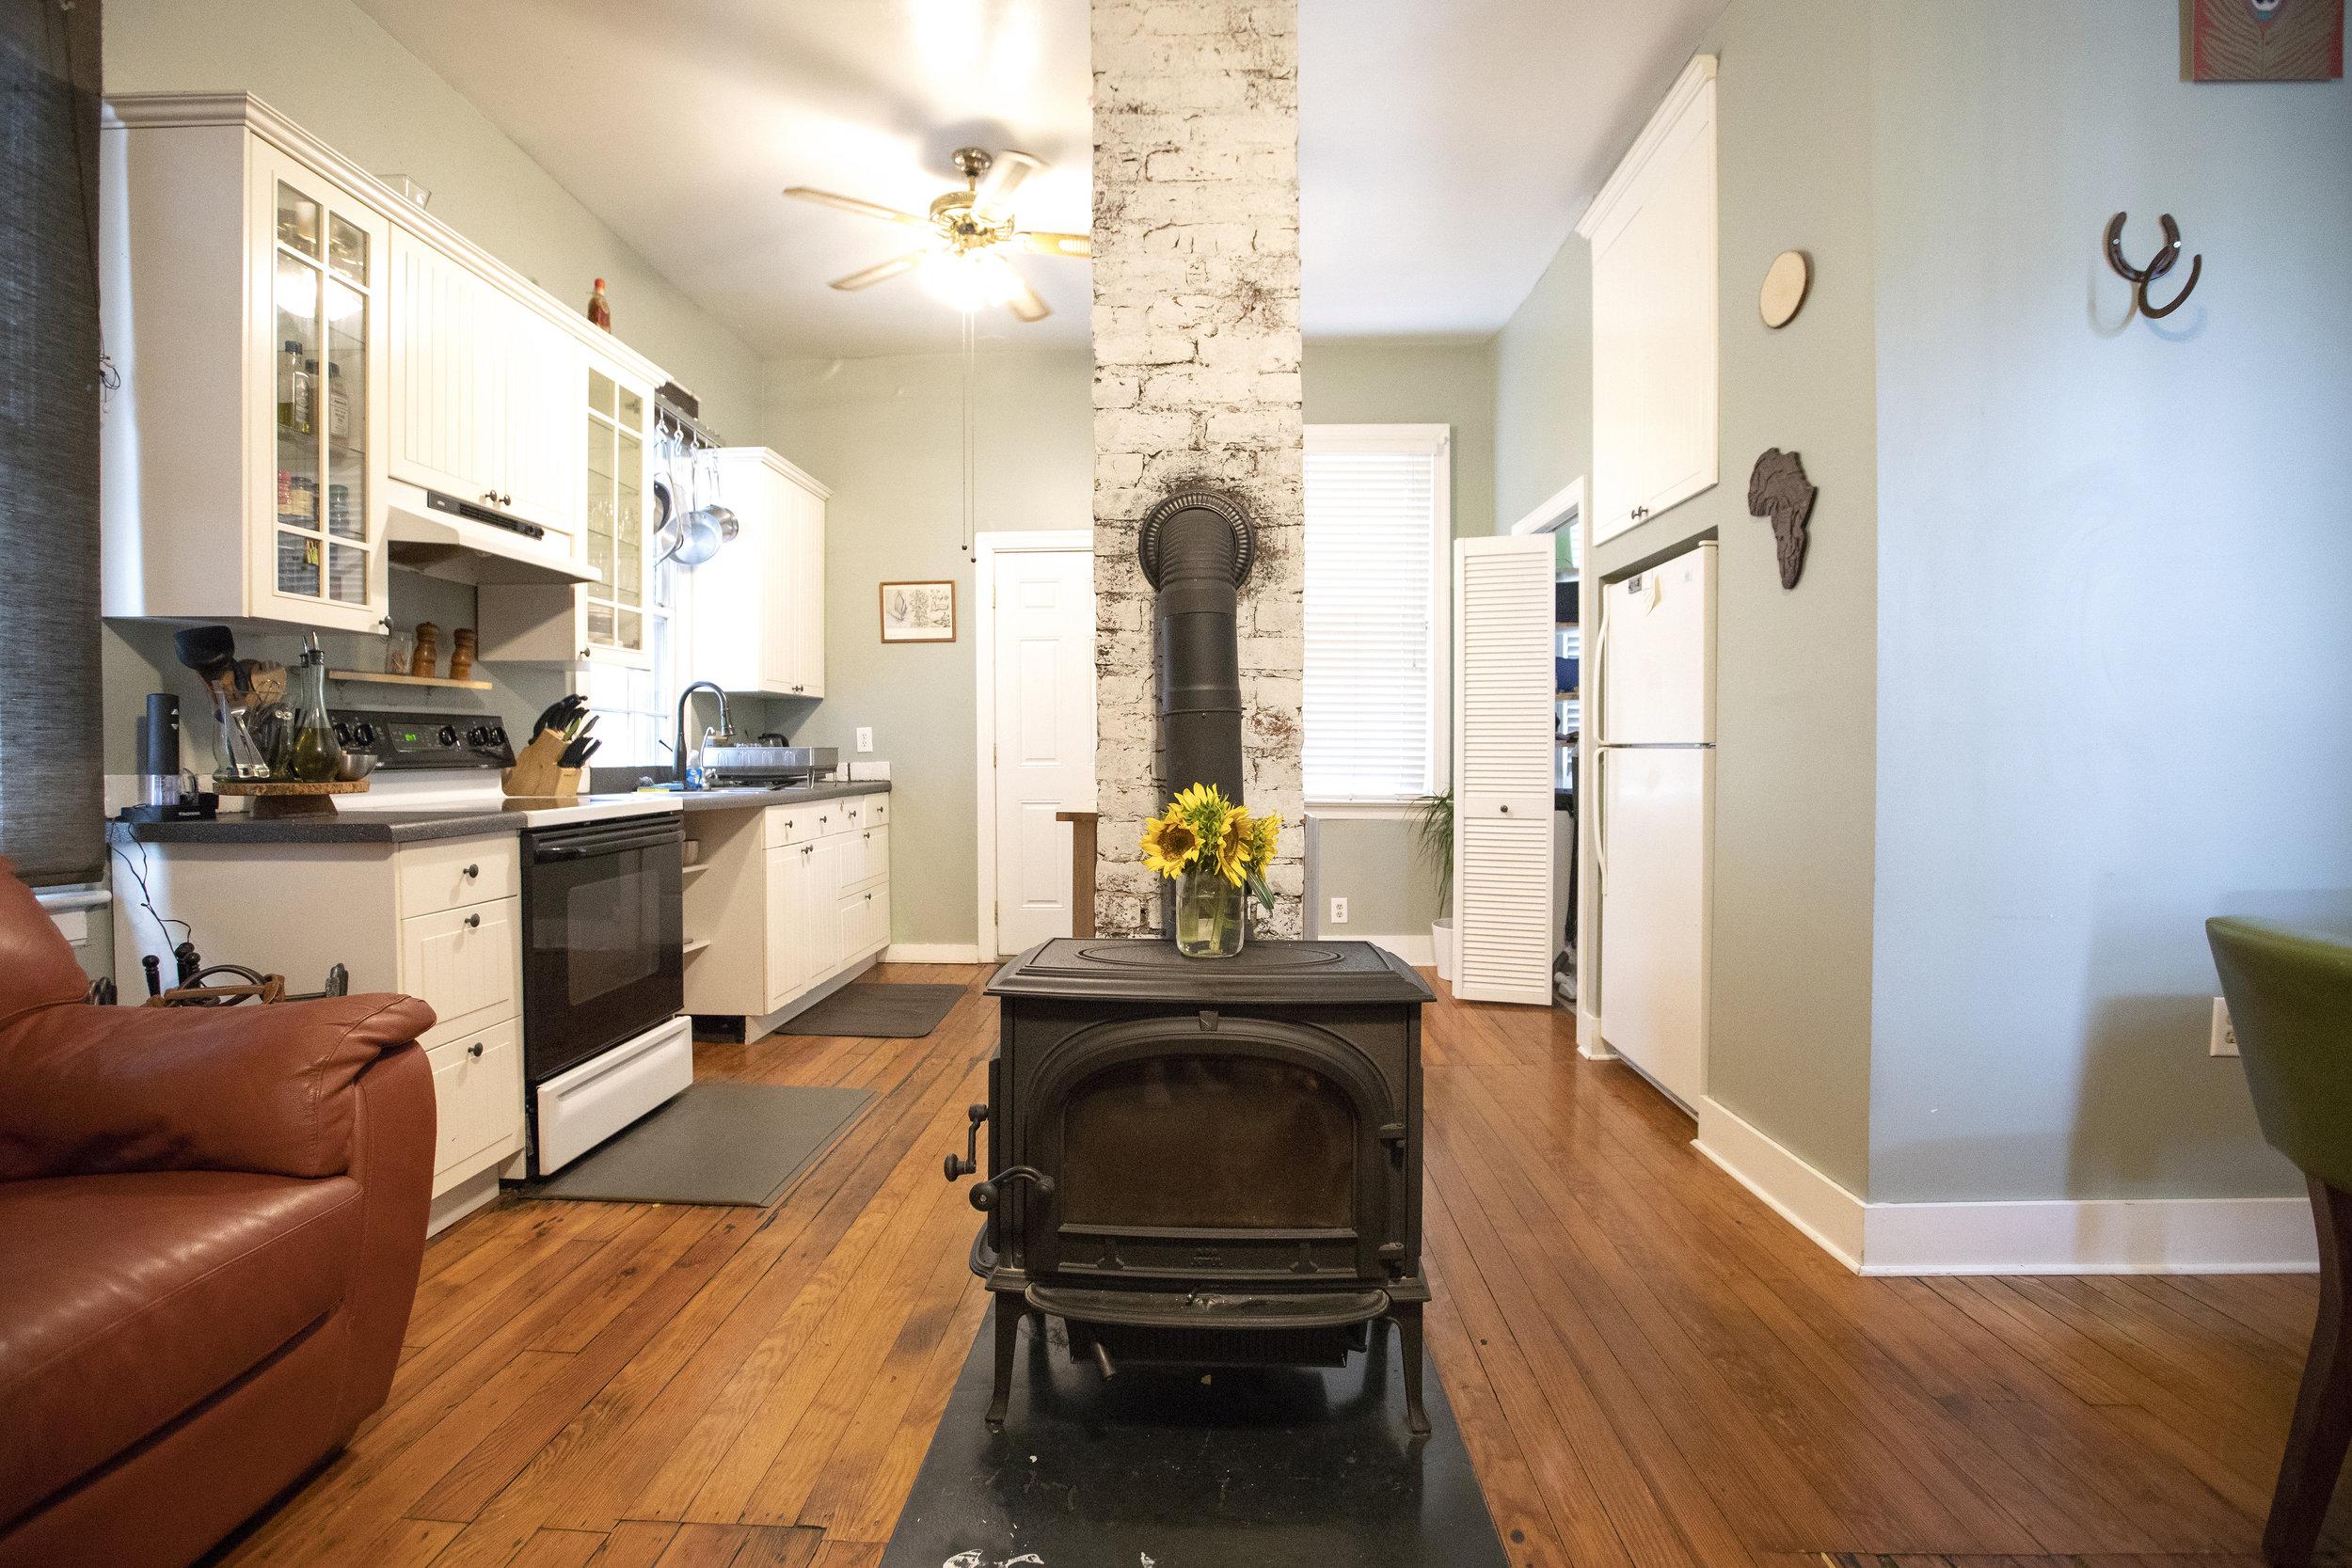 breedavis|airbnb|portfolio|11.jpg